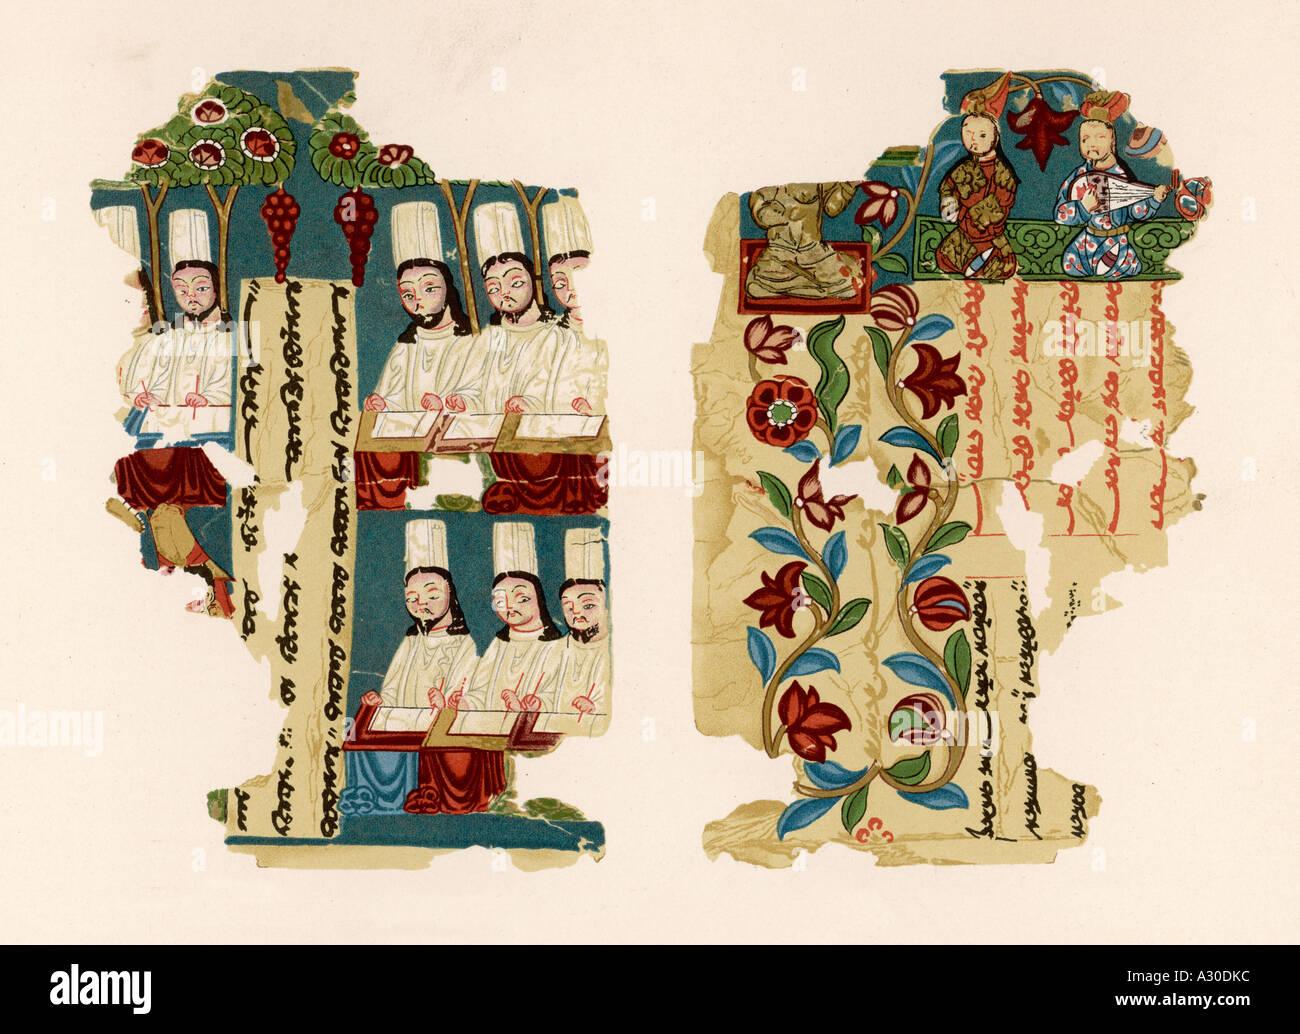 Uigur Dynasty Artefact - Stock Image